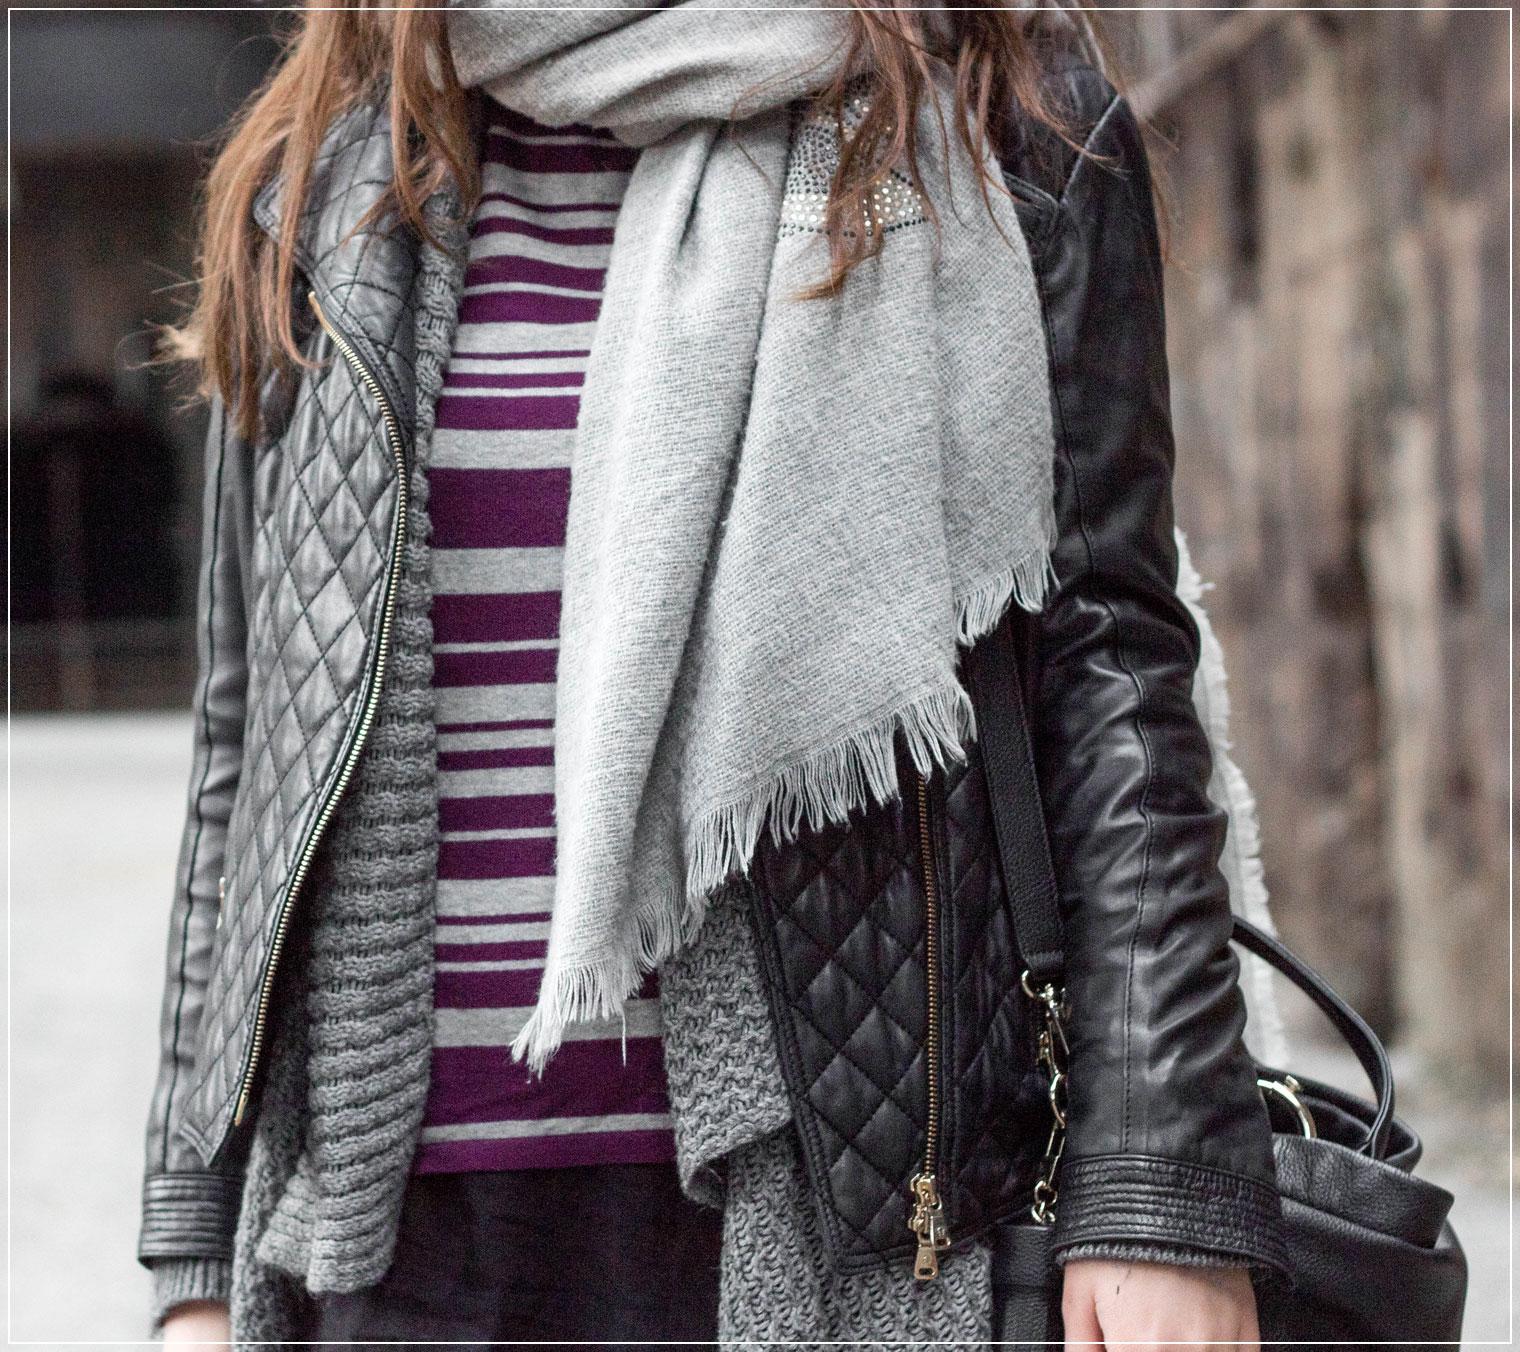 Layering-Look, Layering, Lederjacke, Fruehlingslook, Layering kombinieren, Modetrend, Styleguide, Outfitinspiration, Winterstyle, Alltagslook, Modebloggerin, Fashionbloggerin, Modeblog, Ruhrgebiet